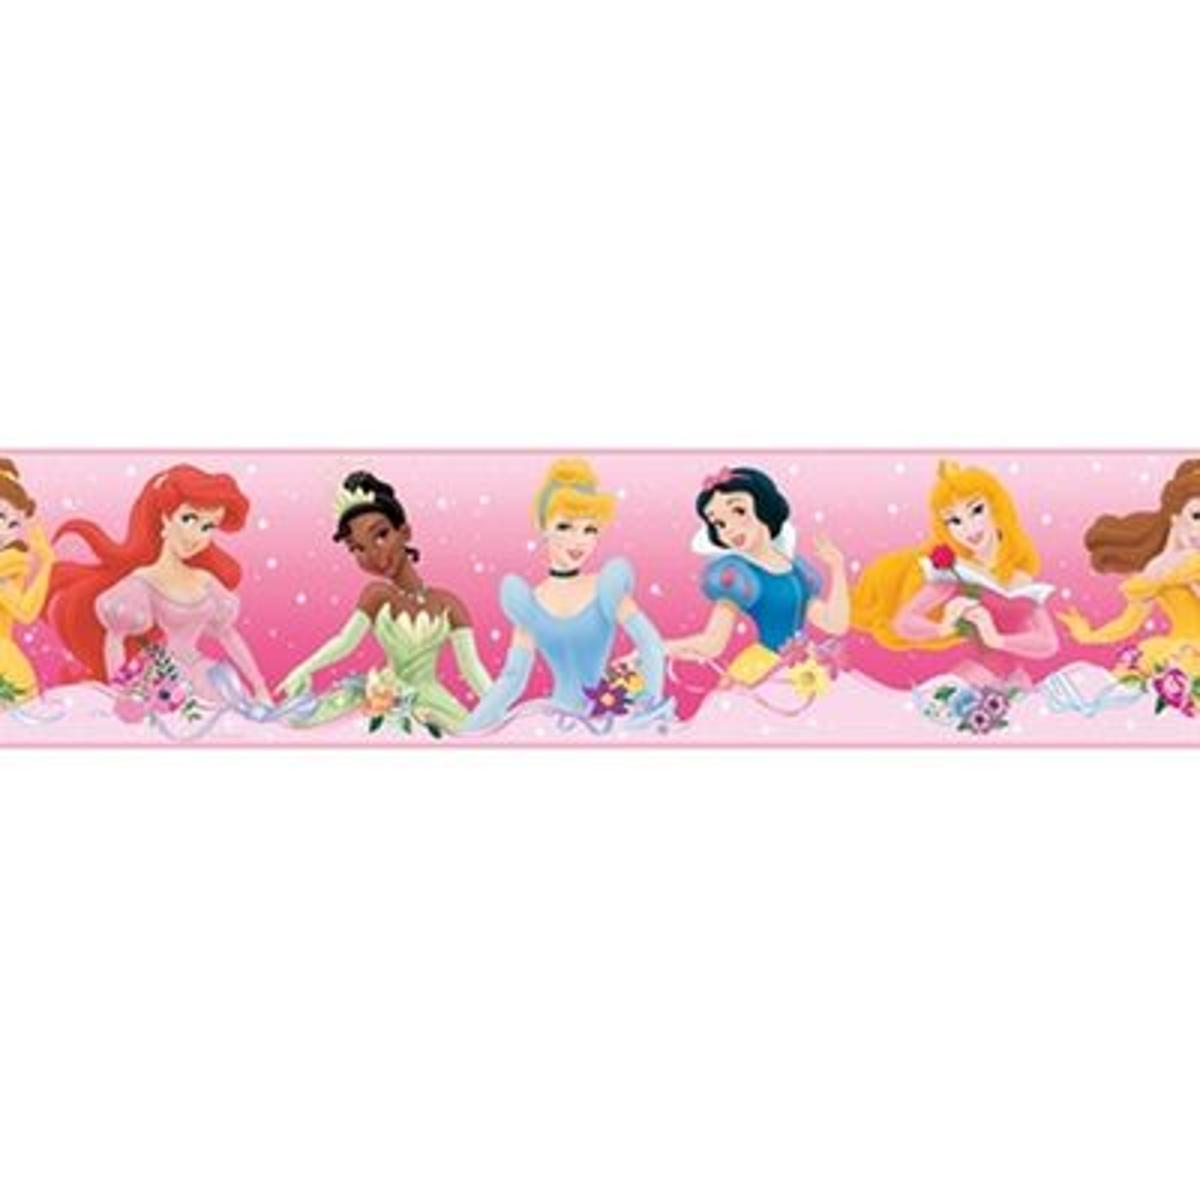 Frise repositionnable Princesse Disney Rose